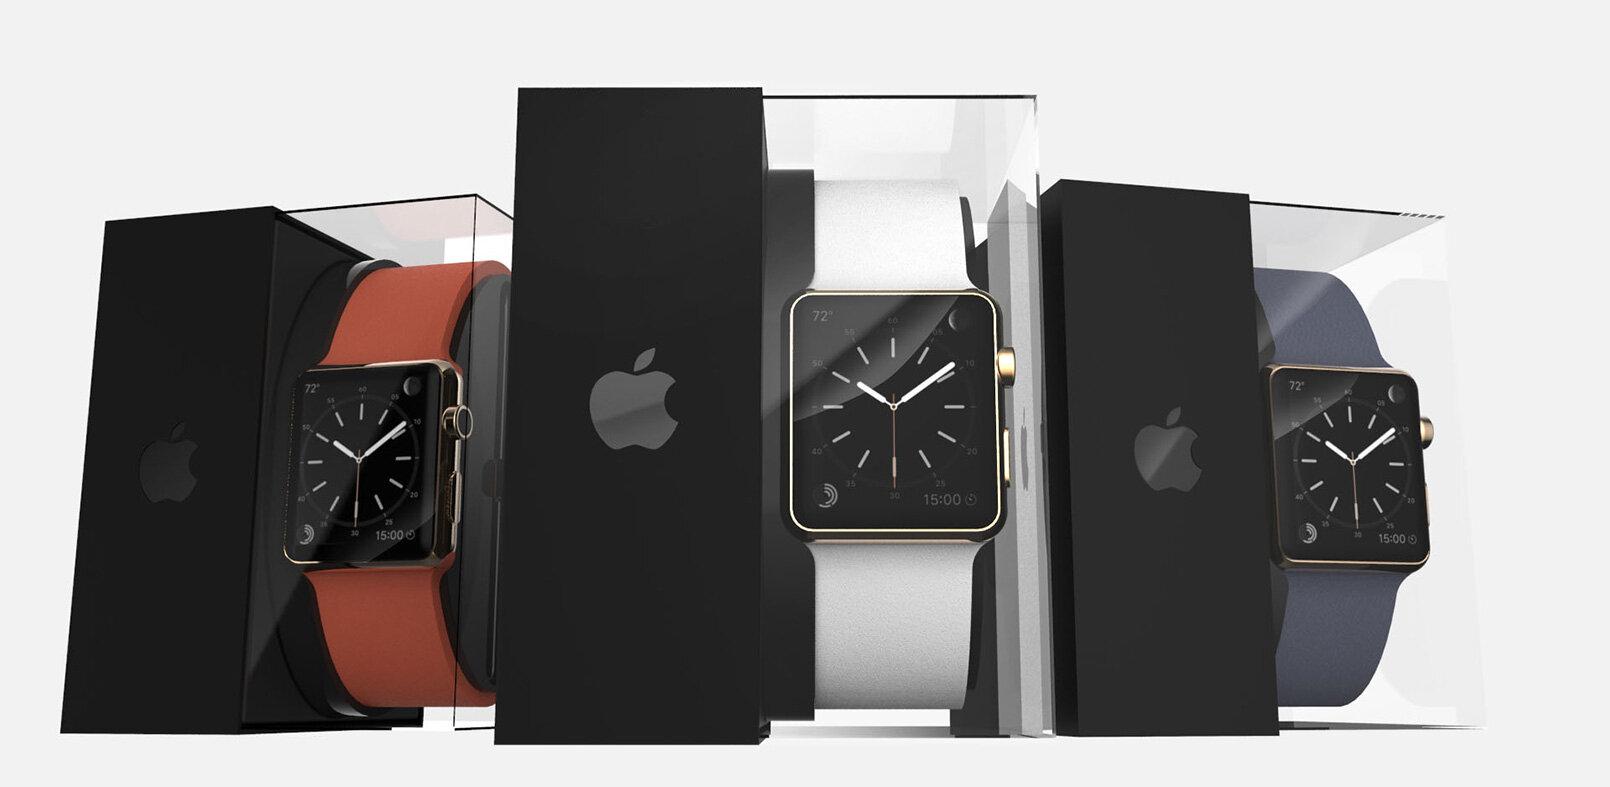 Apple-Watch-Smartwatch-Packaging-Design-iWatch-Indable-Technology-6.JPG